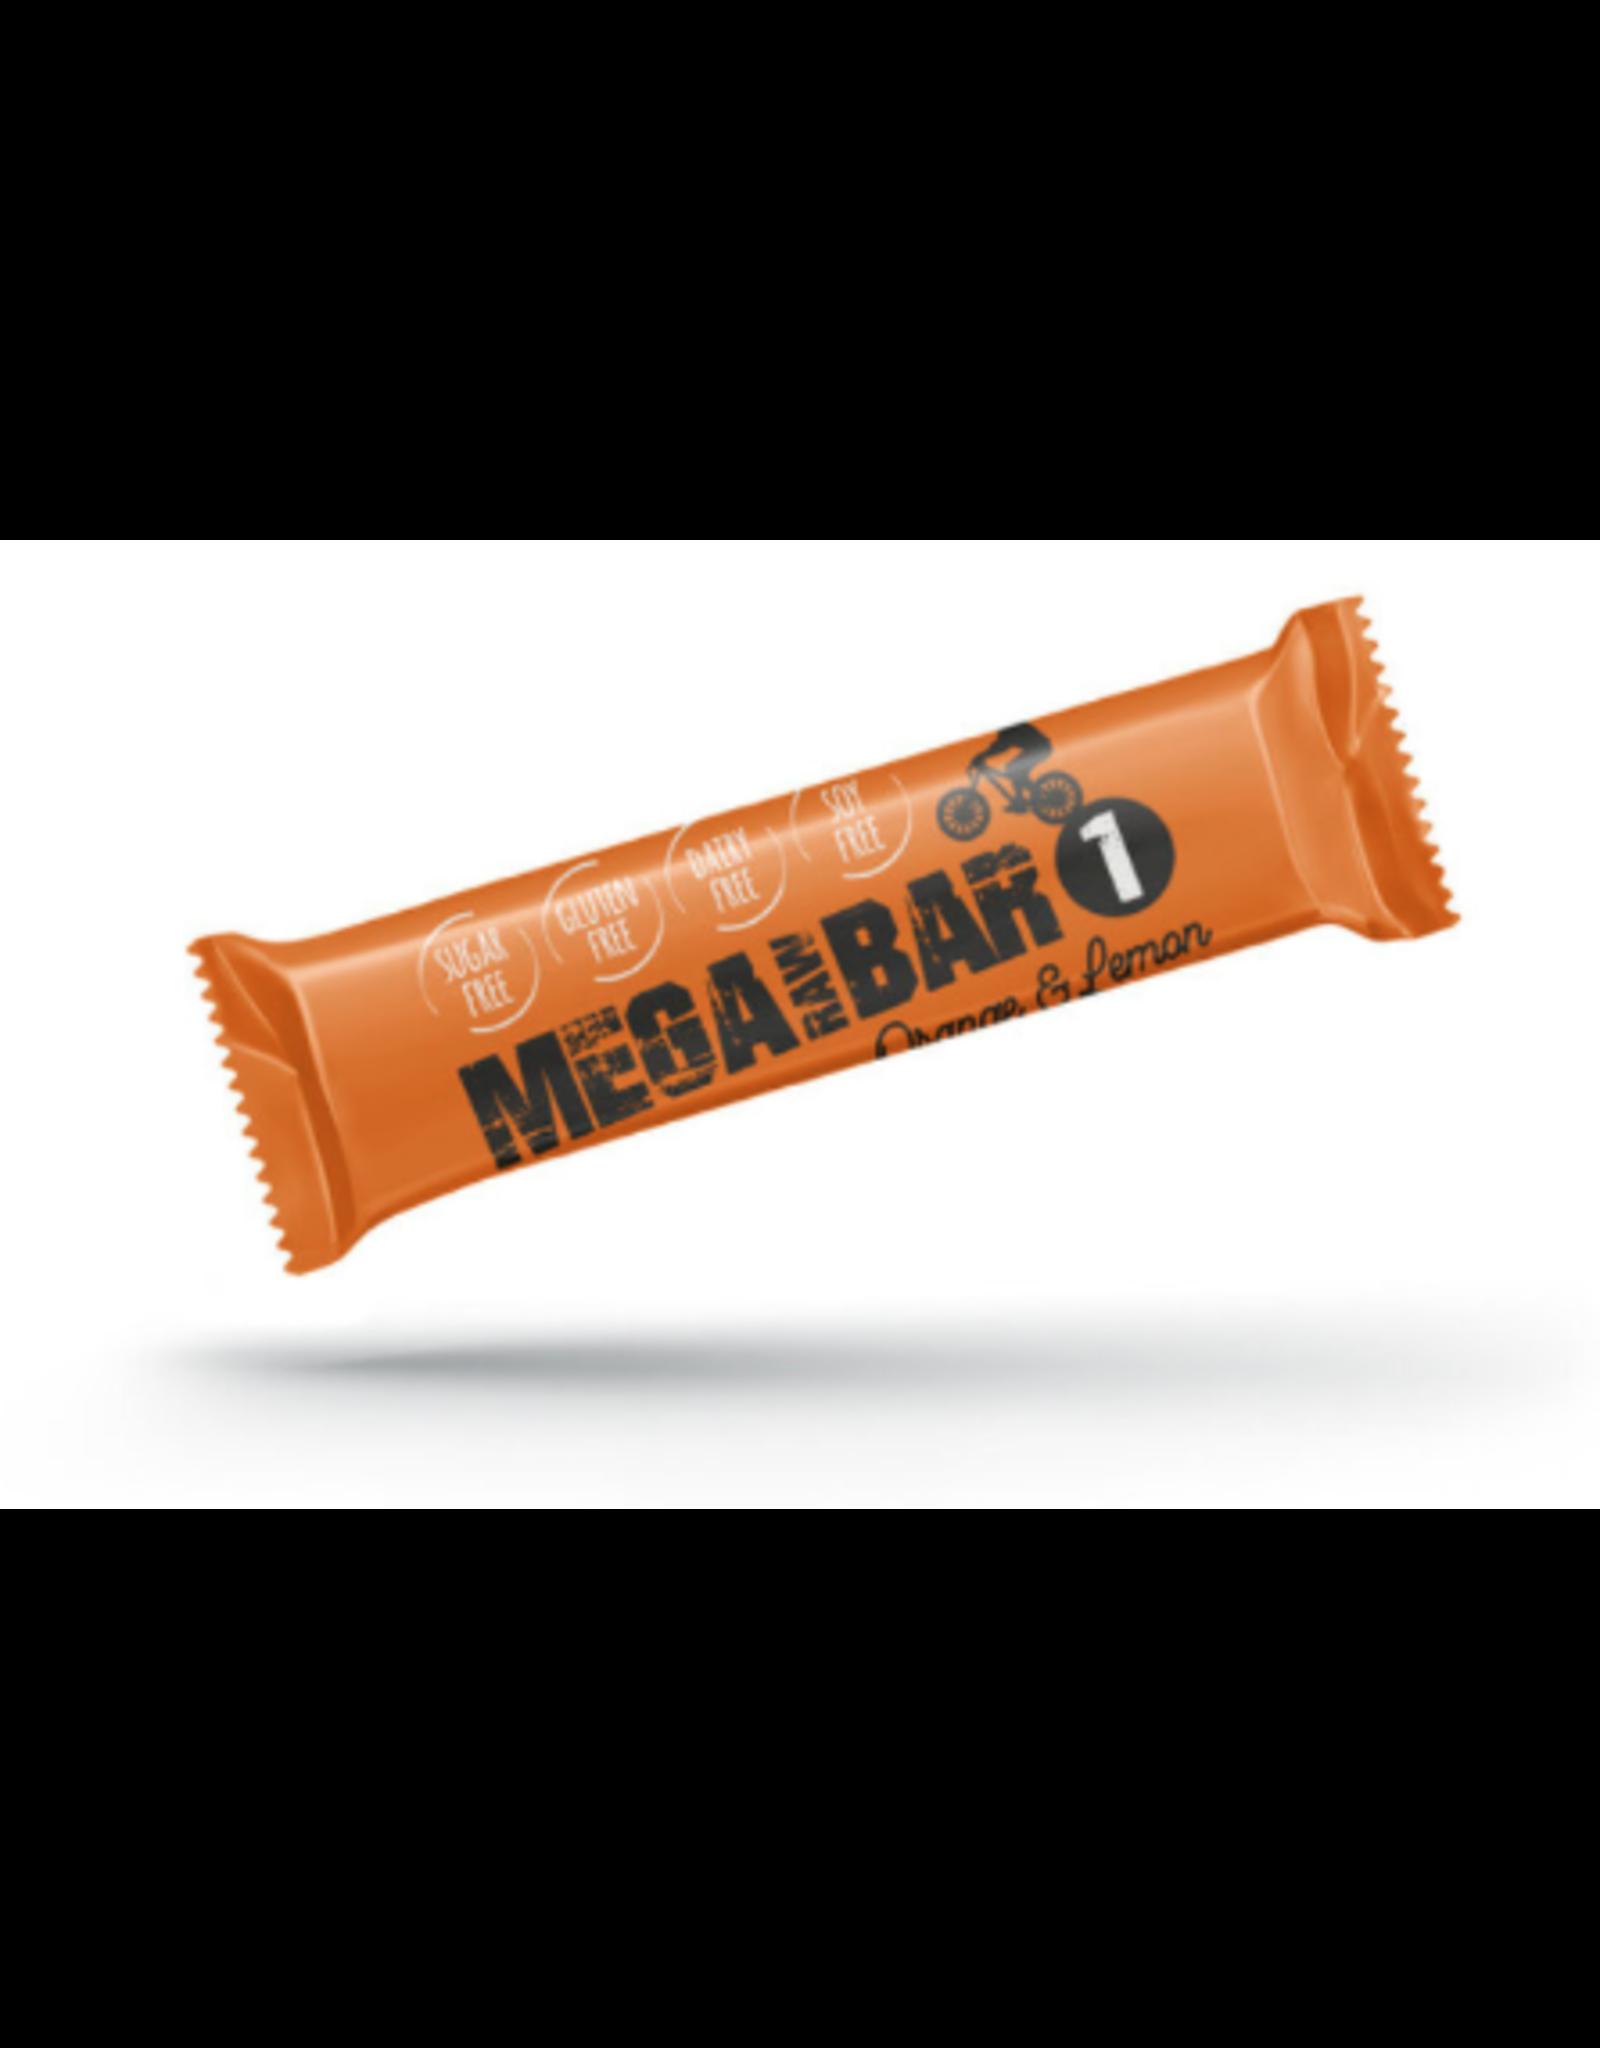 MEGARAWBAR 1, PACK, 12 x 40g